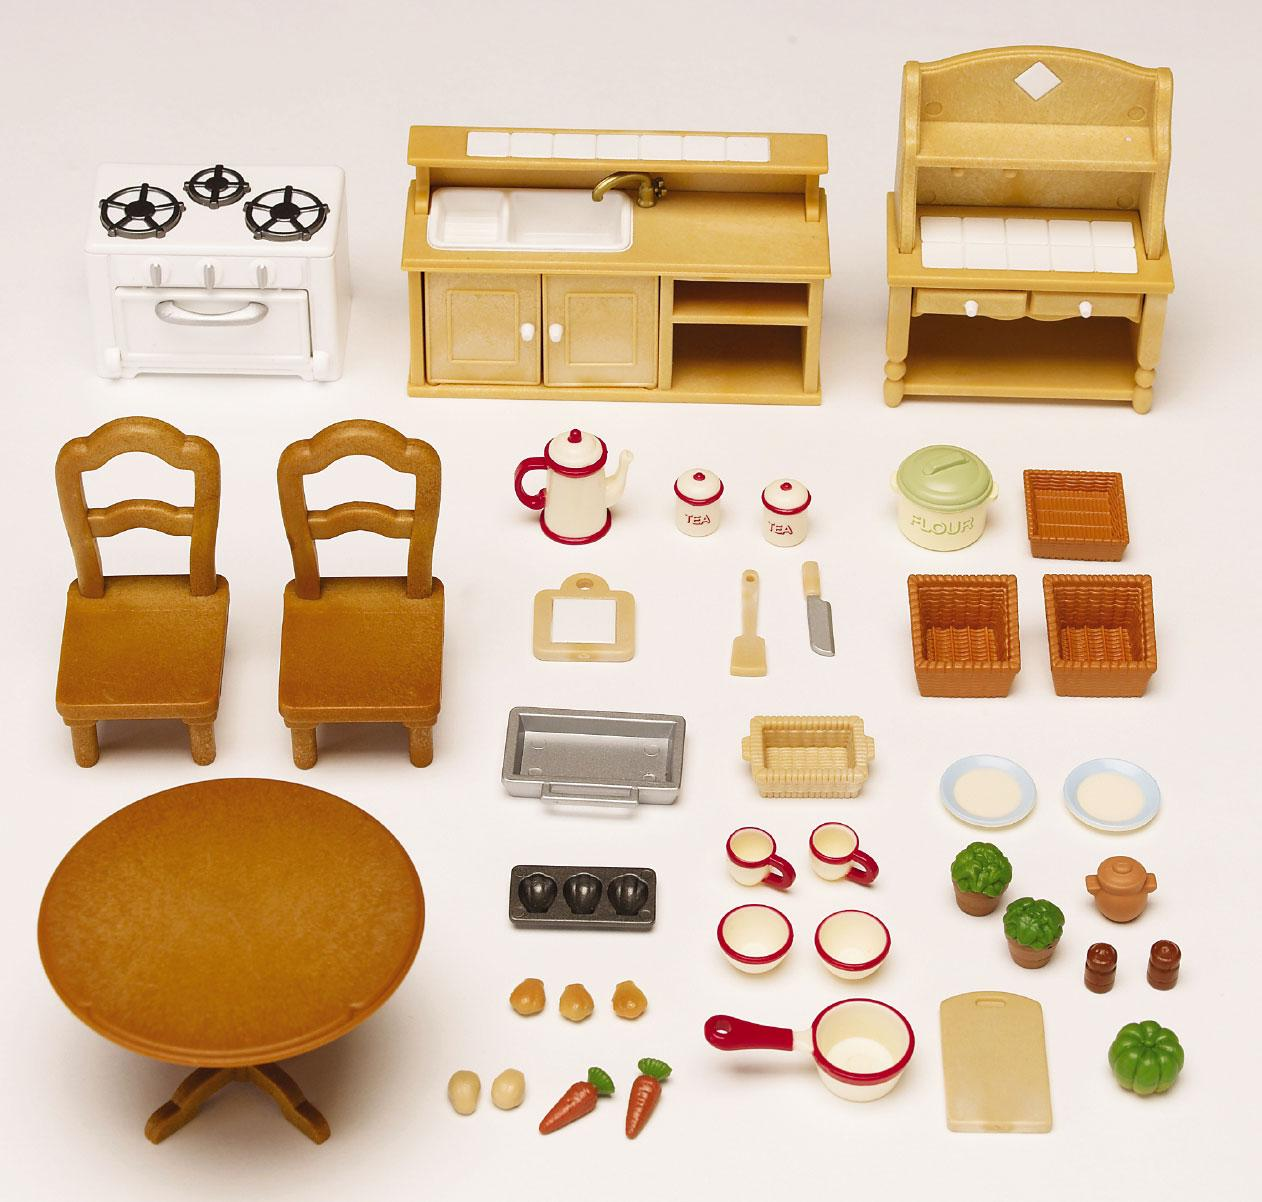 Deluxe Kitchen Set